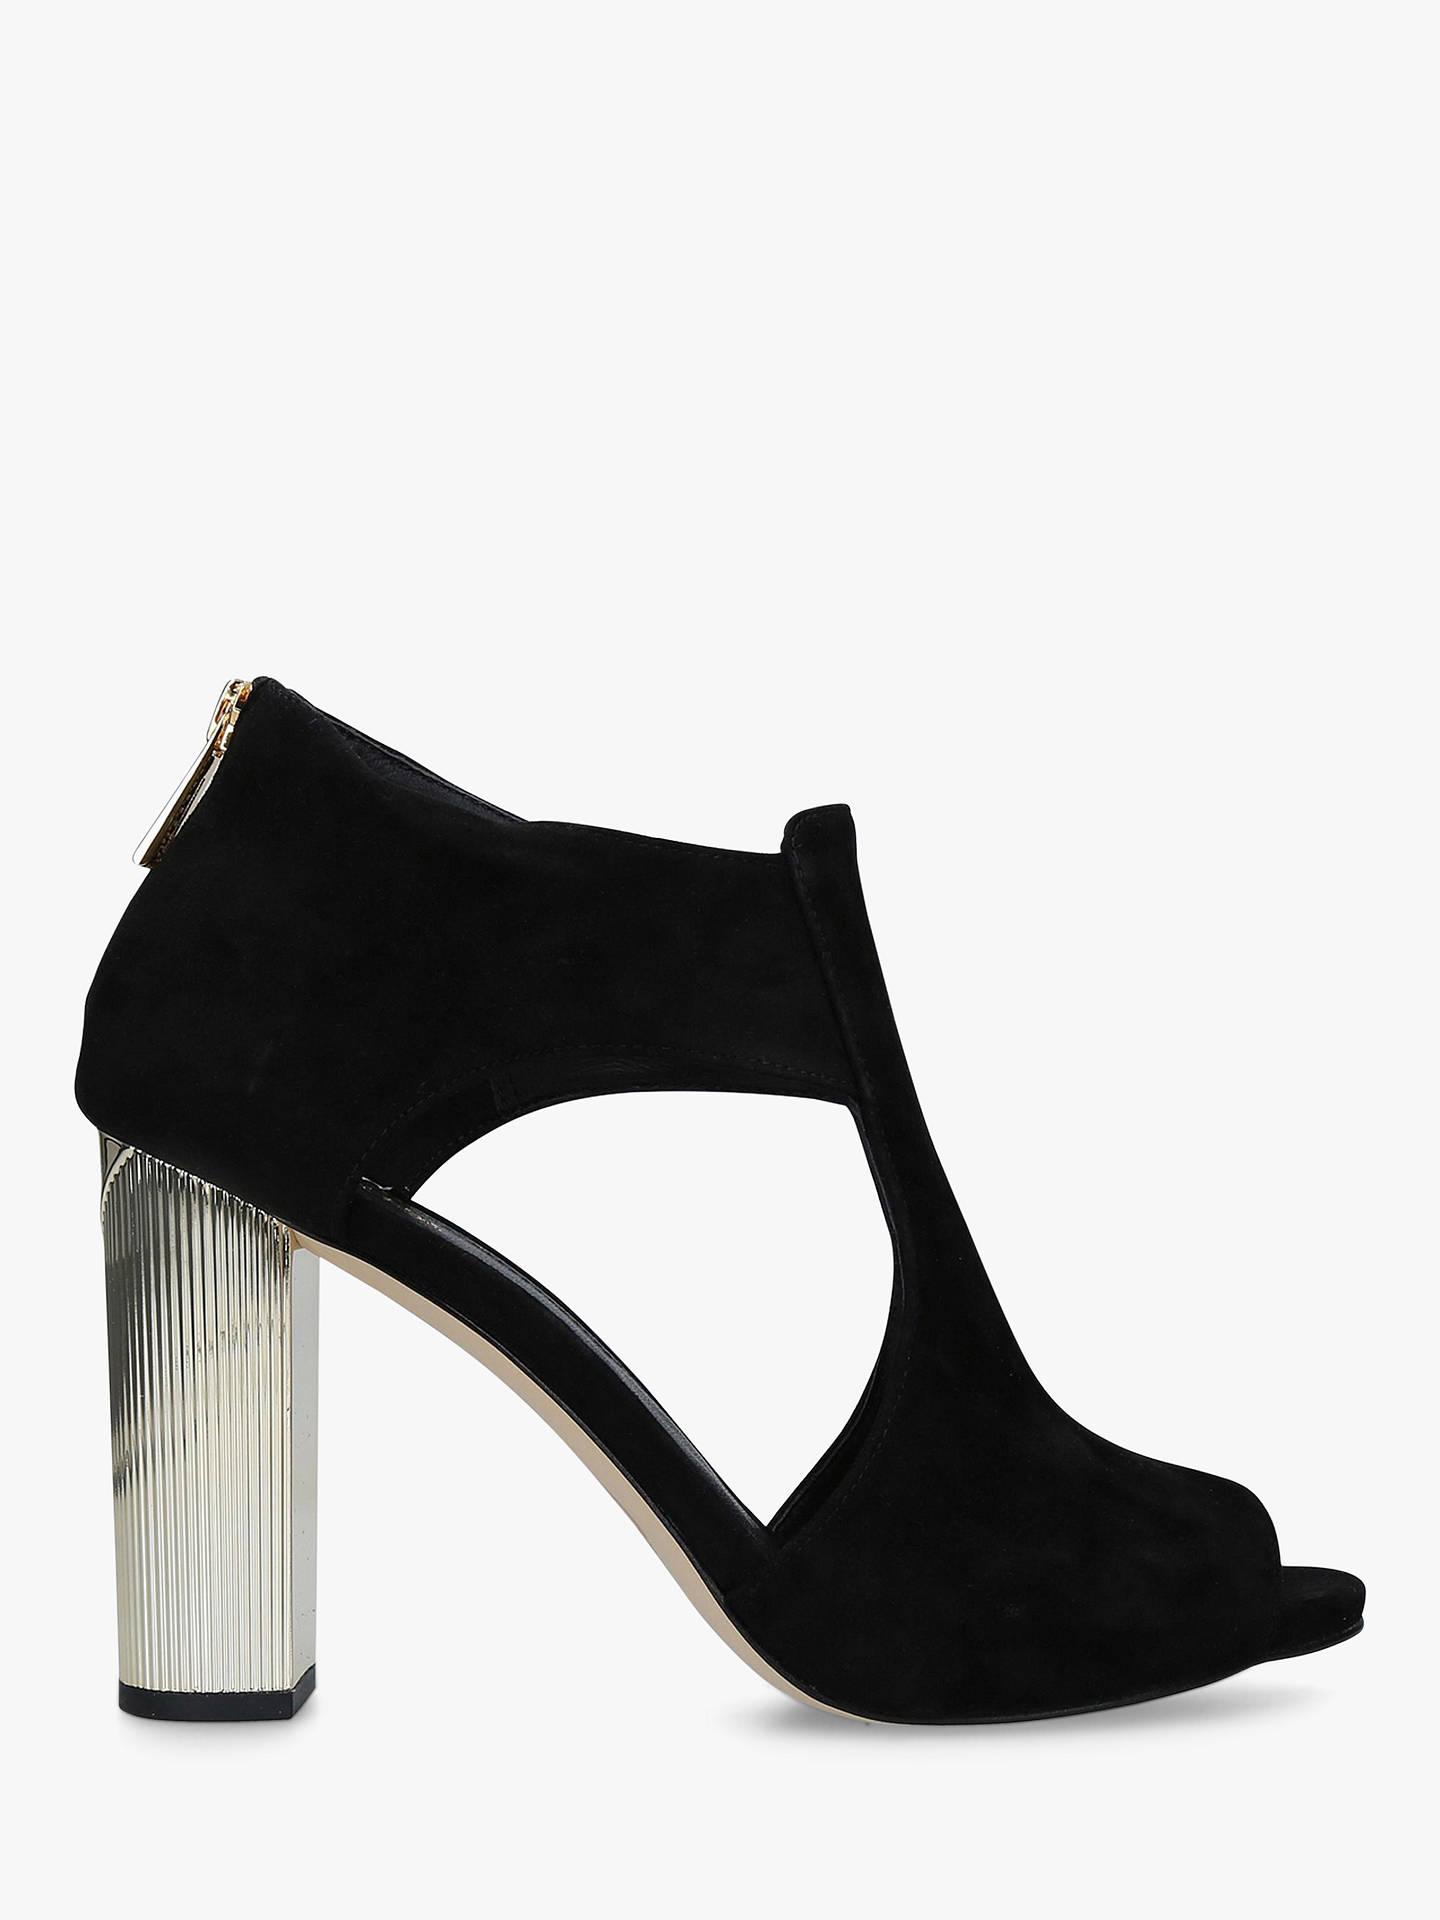 be38a5270d Buy MICHAEL Michael Kors Paloma Block Heel Peep Toe Shoe Boots, Black  Suede, 4.5 ...